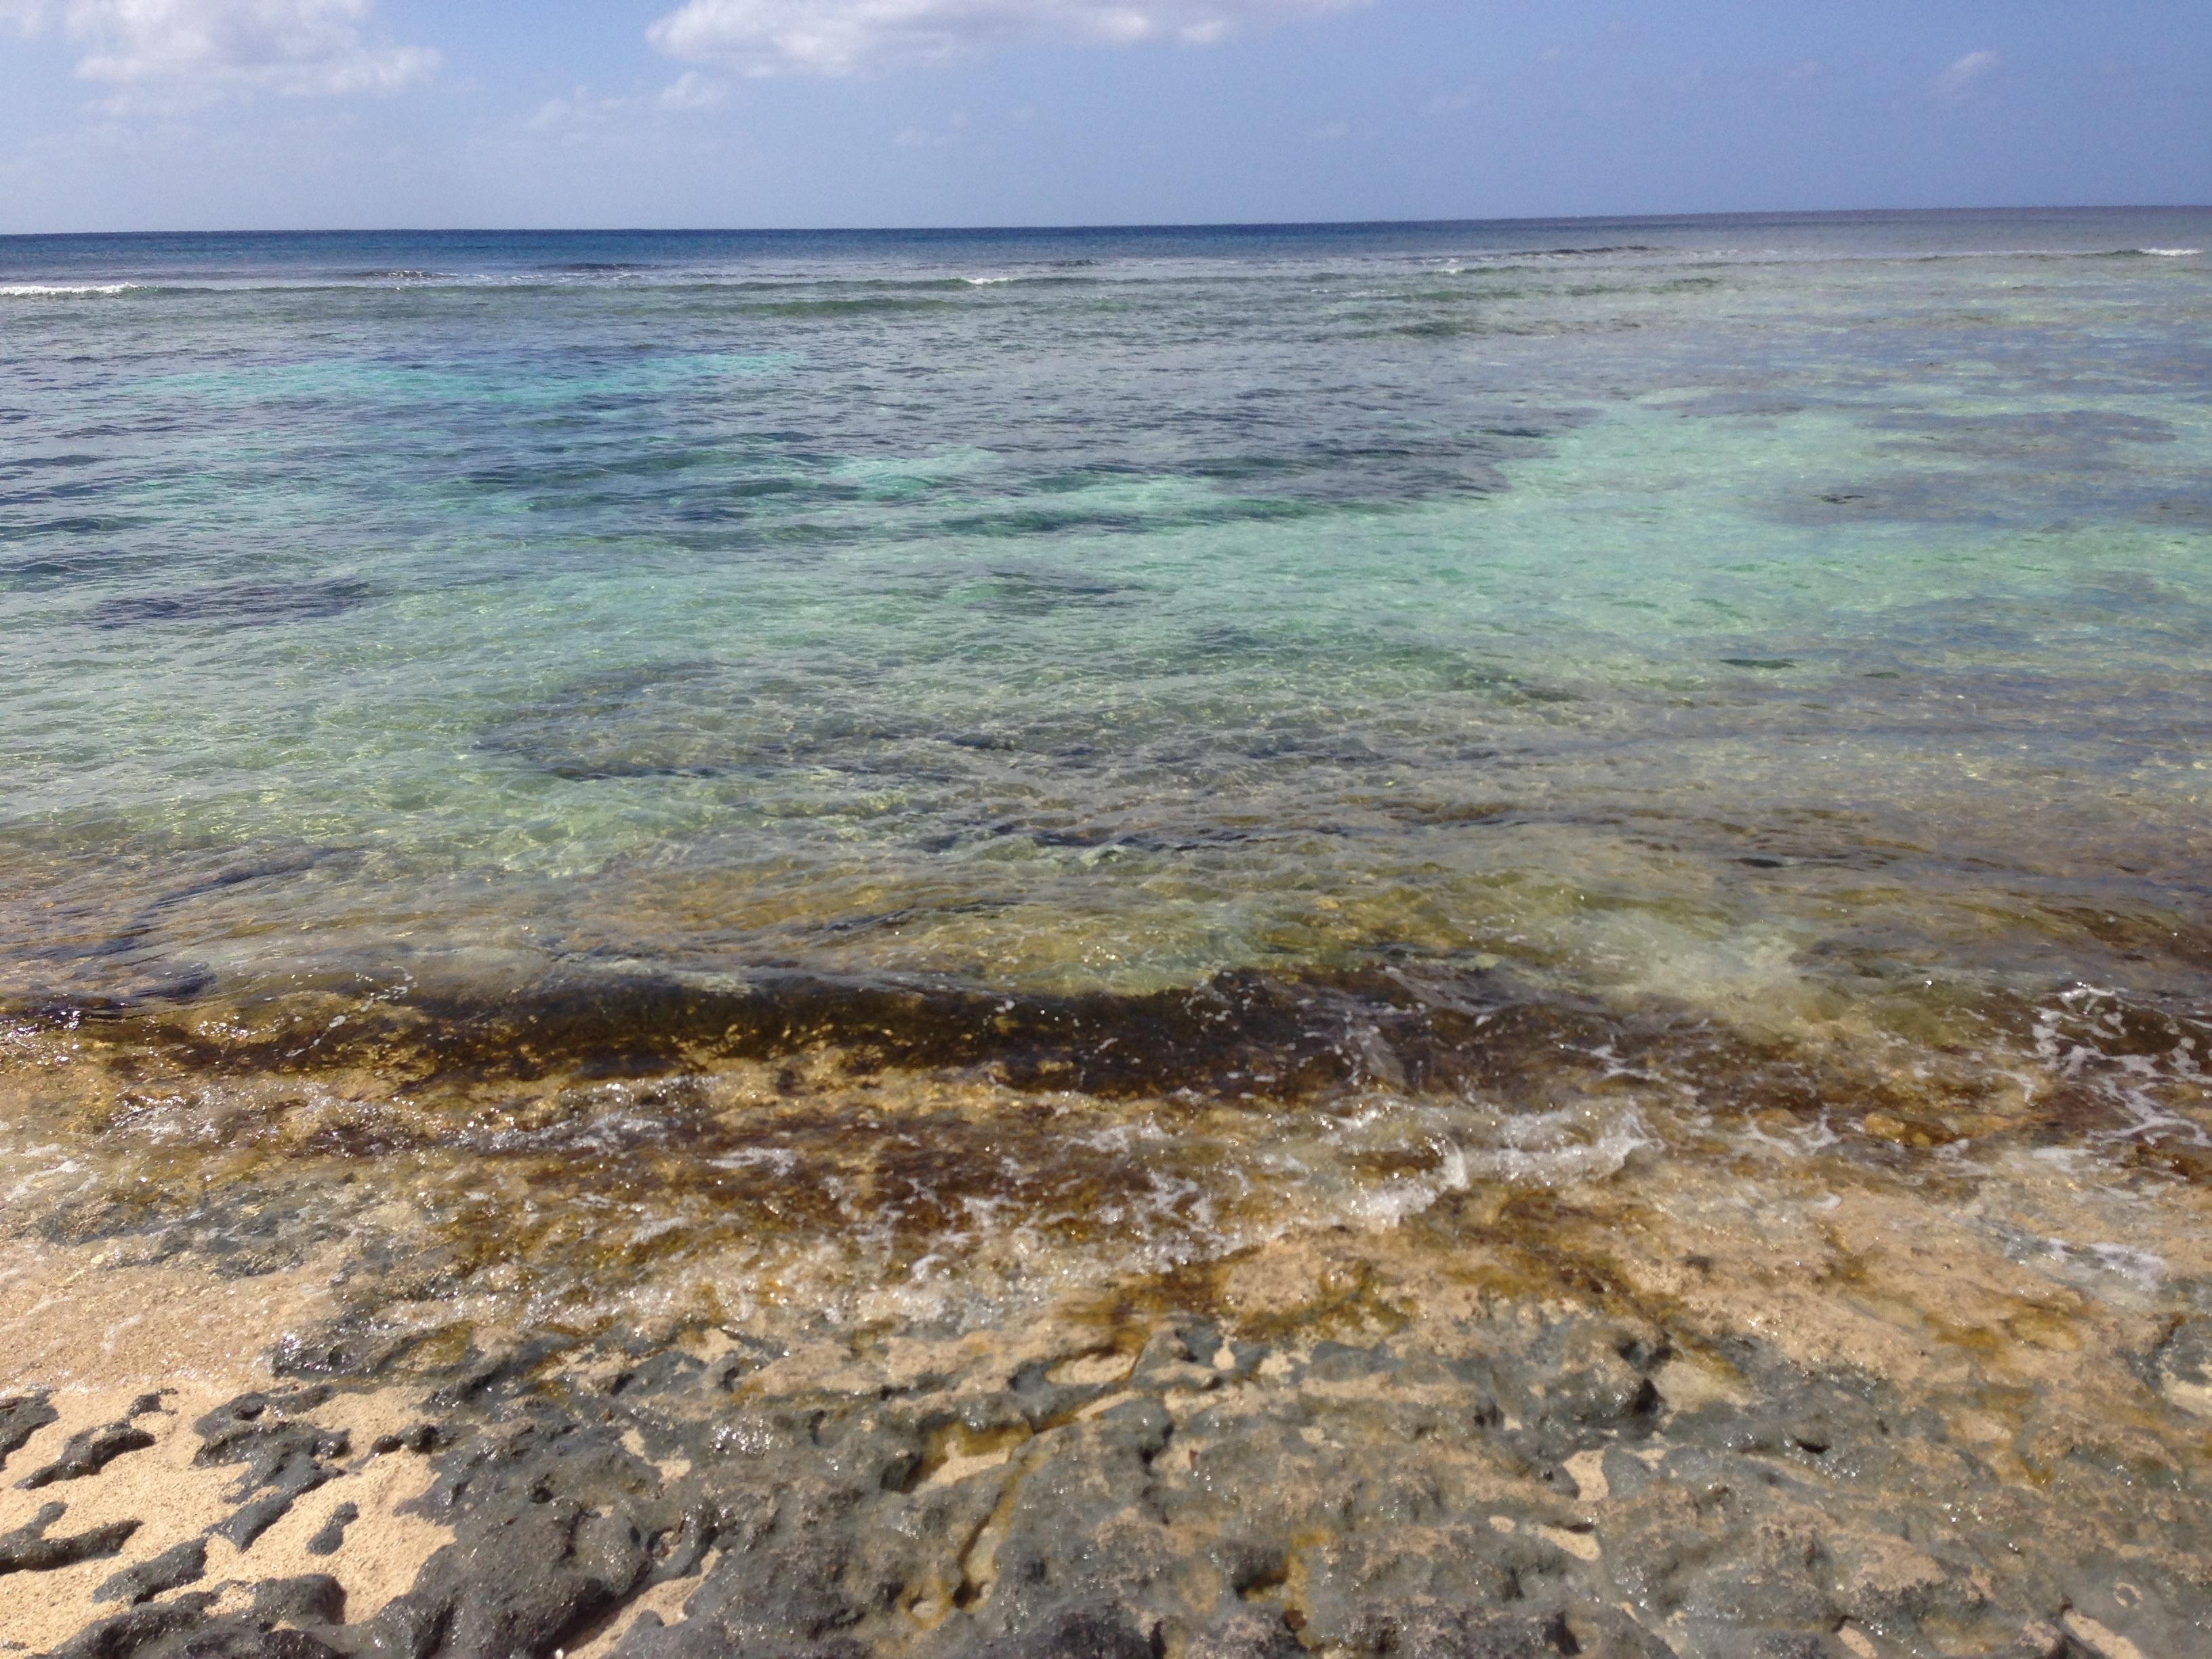 Free Images : beach, sea, coast, sand, rock, ocean, white